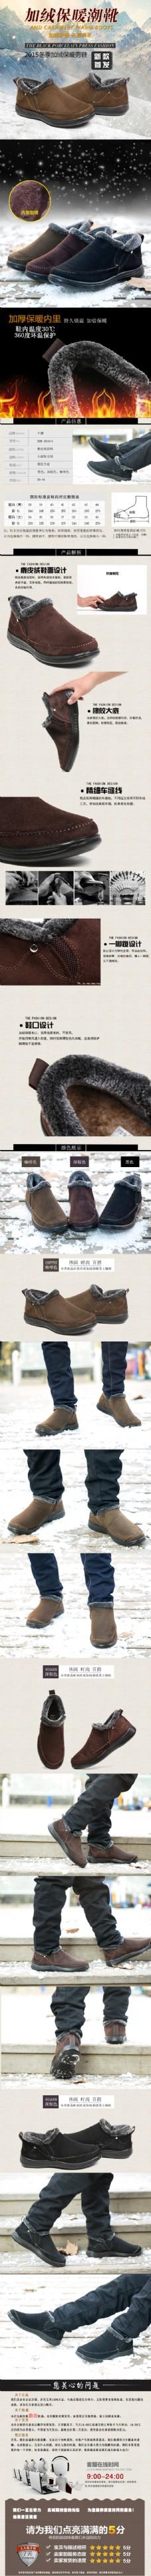 棉鞋產品詳情頁